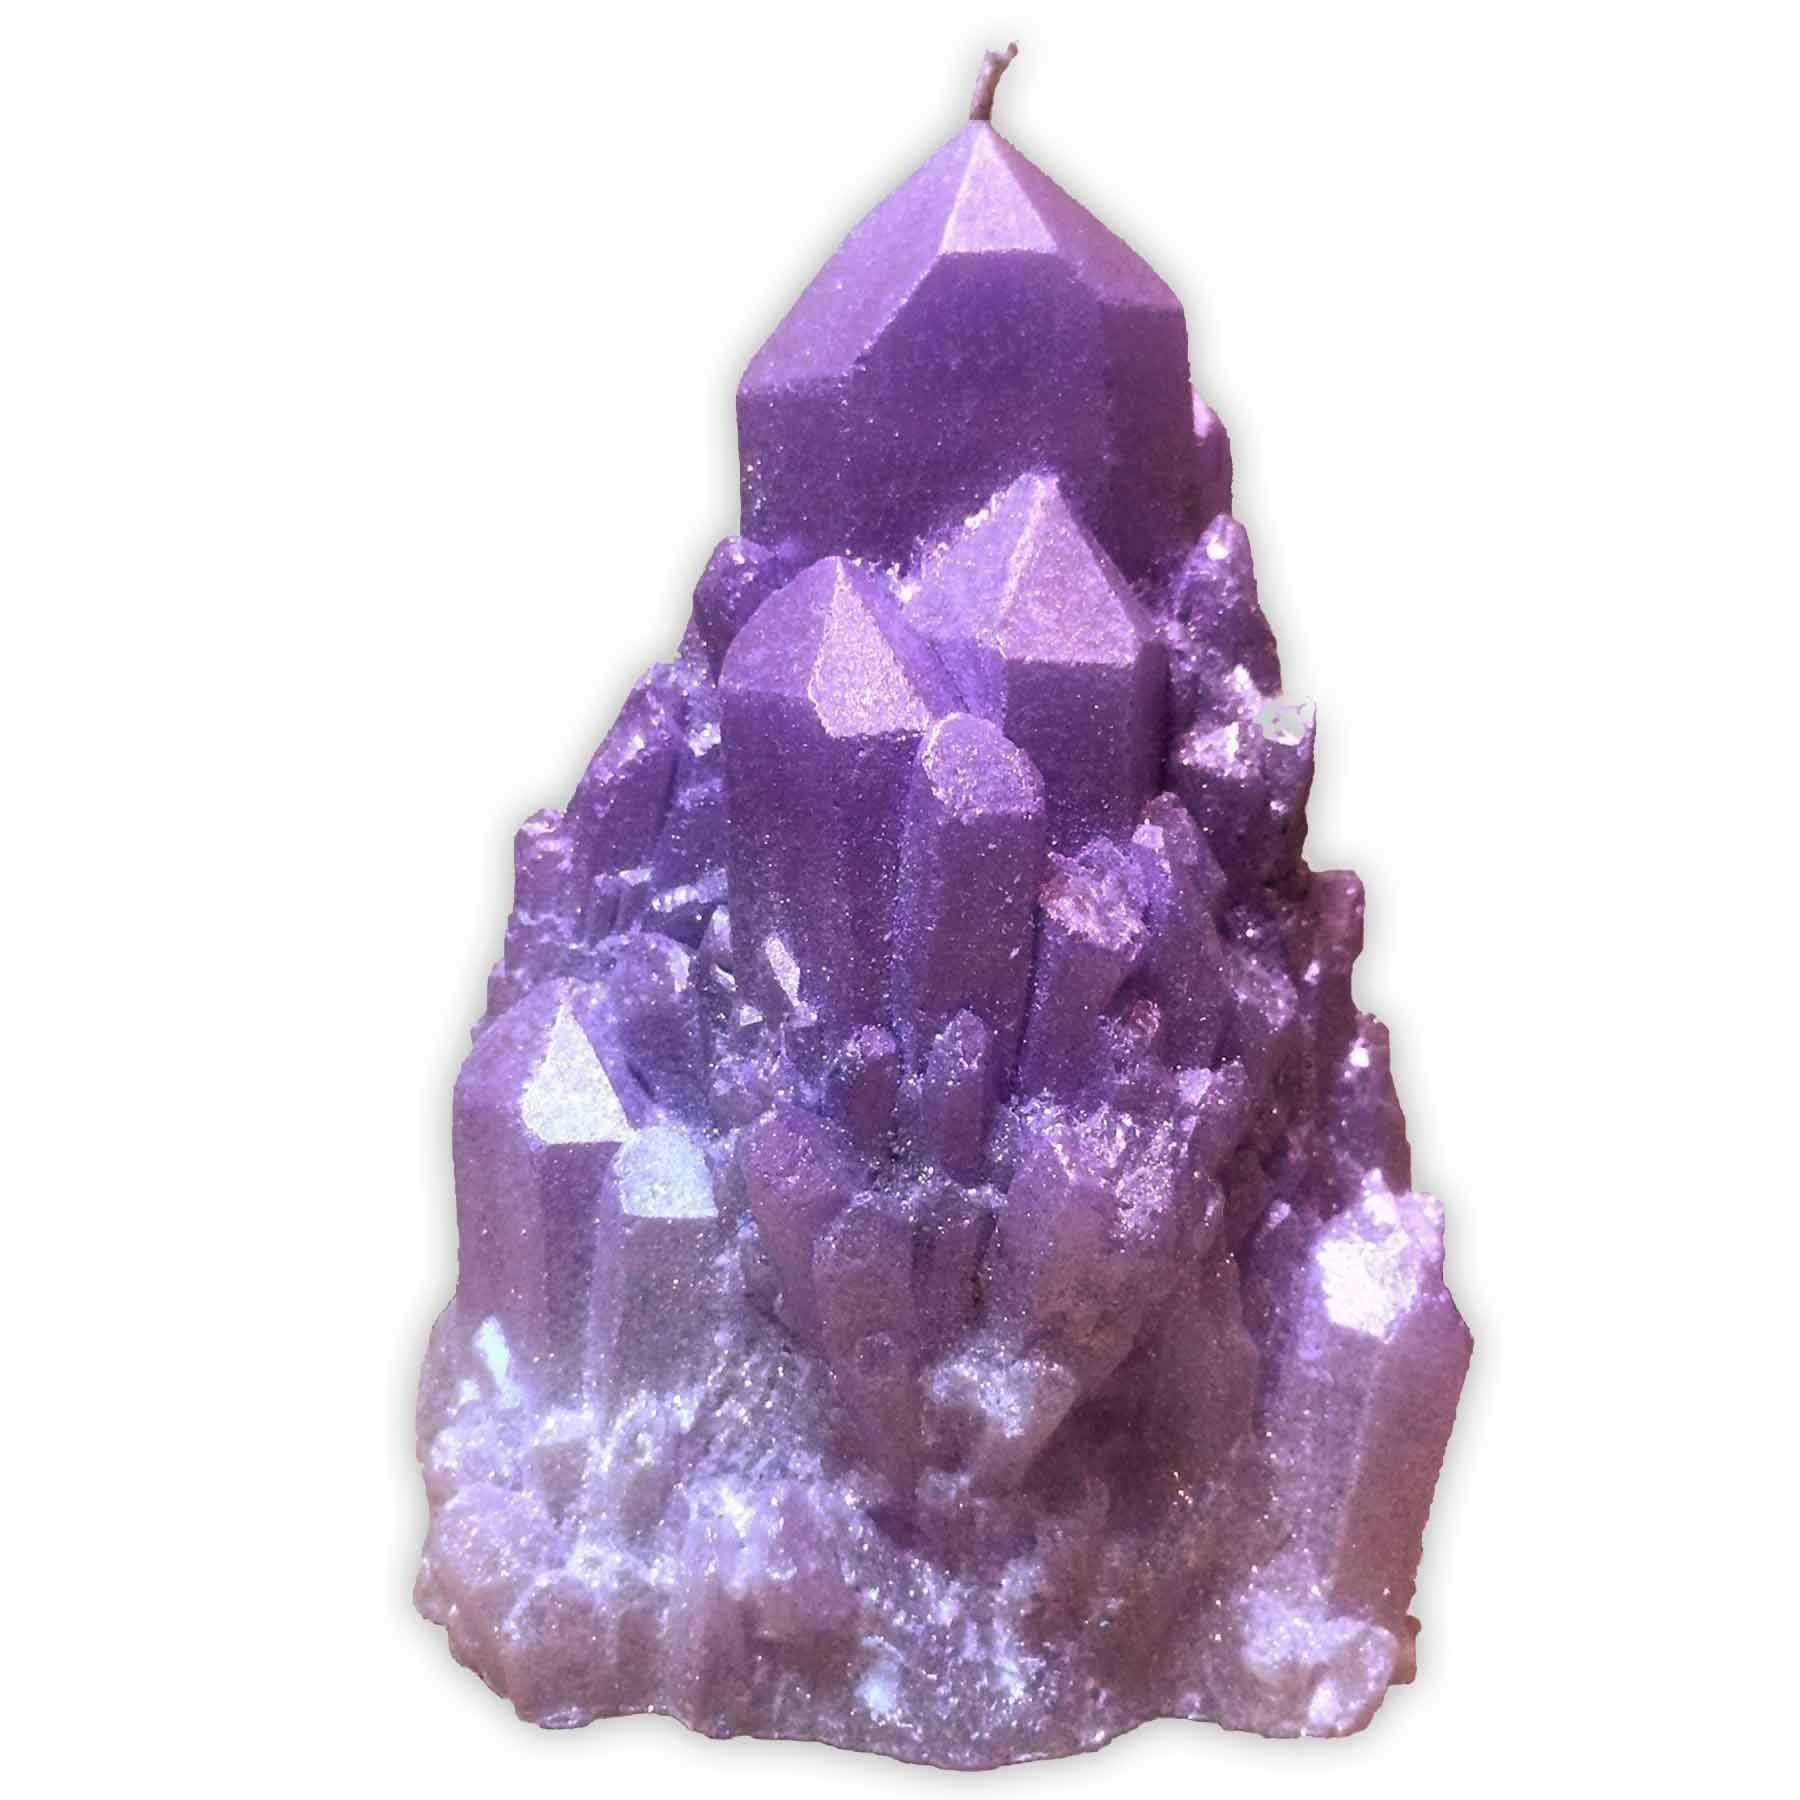 ABUNDANCE QUARTZ CRYSTAL Candle in Amethyst (purple) by Zen Den Candles